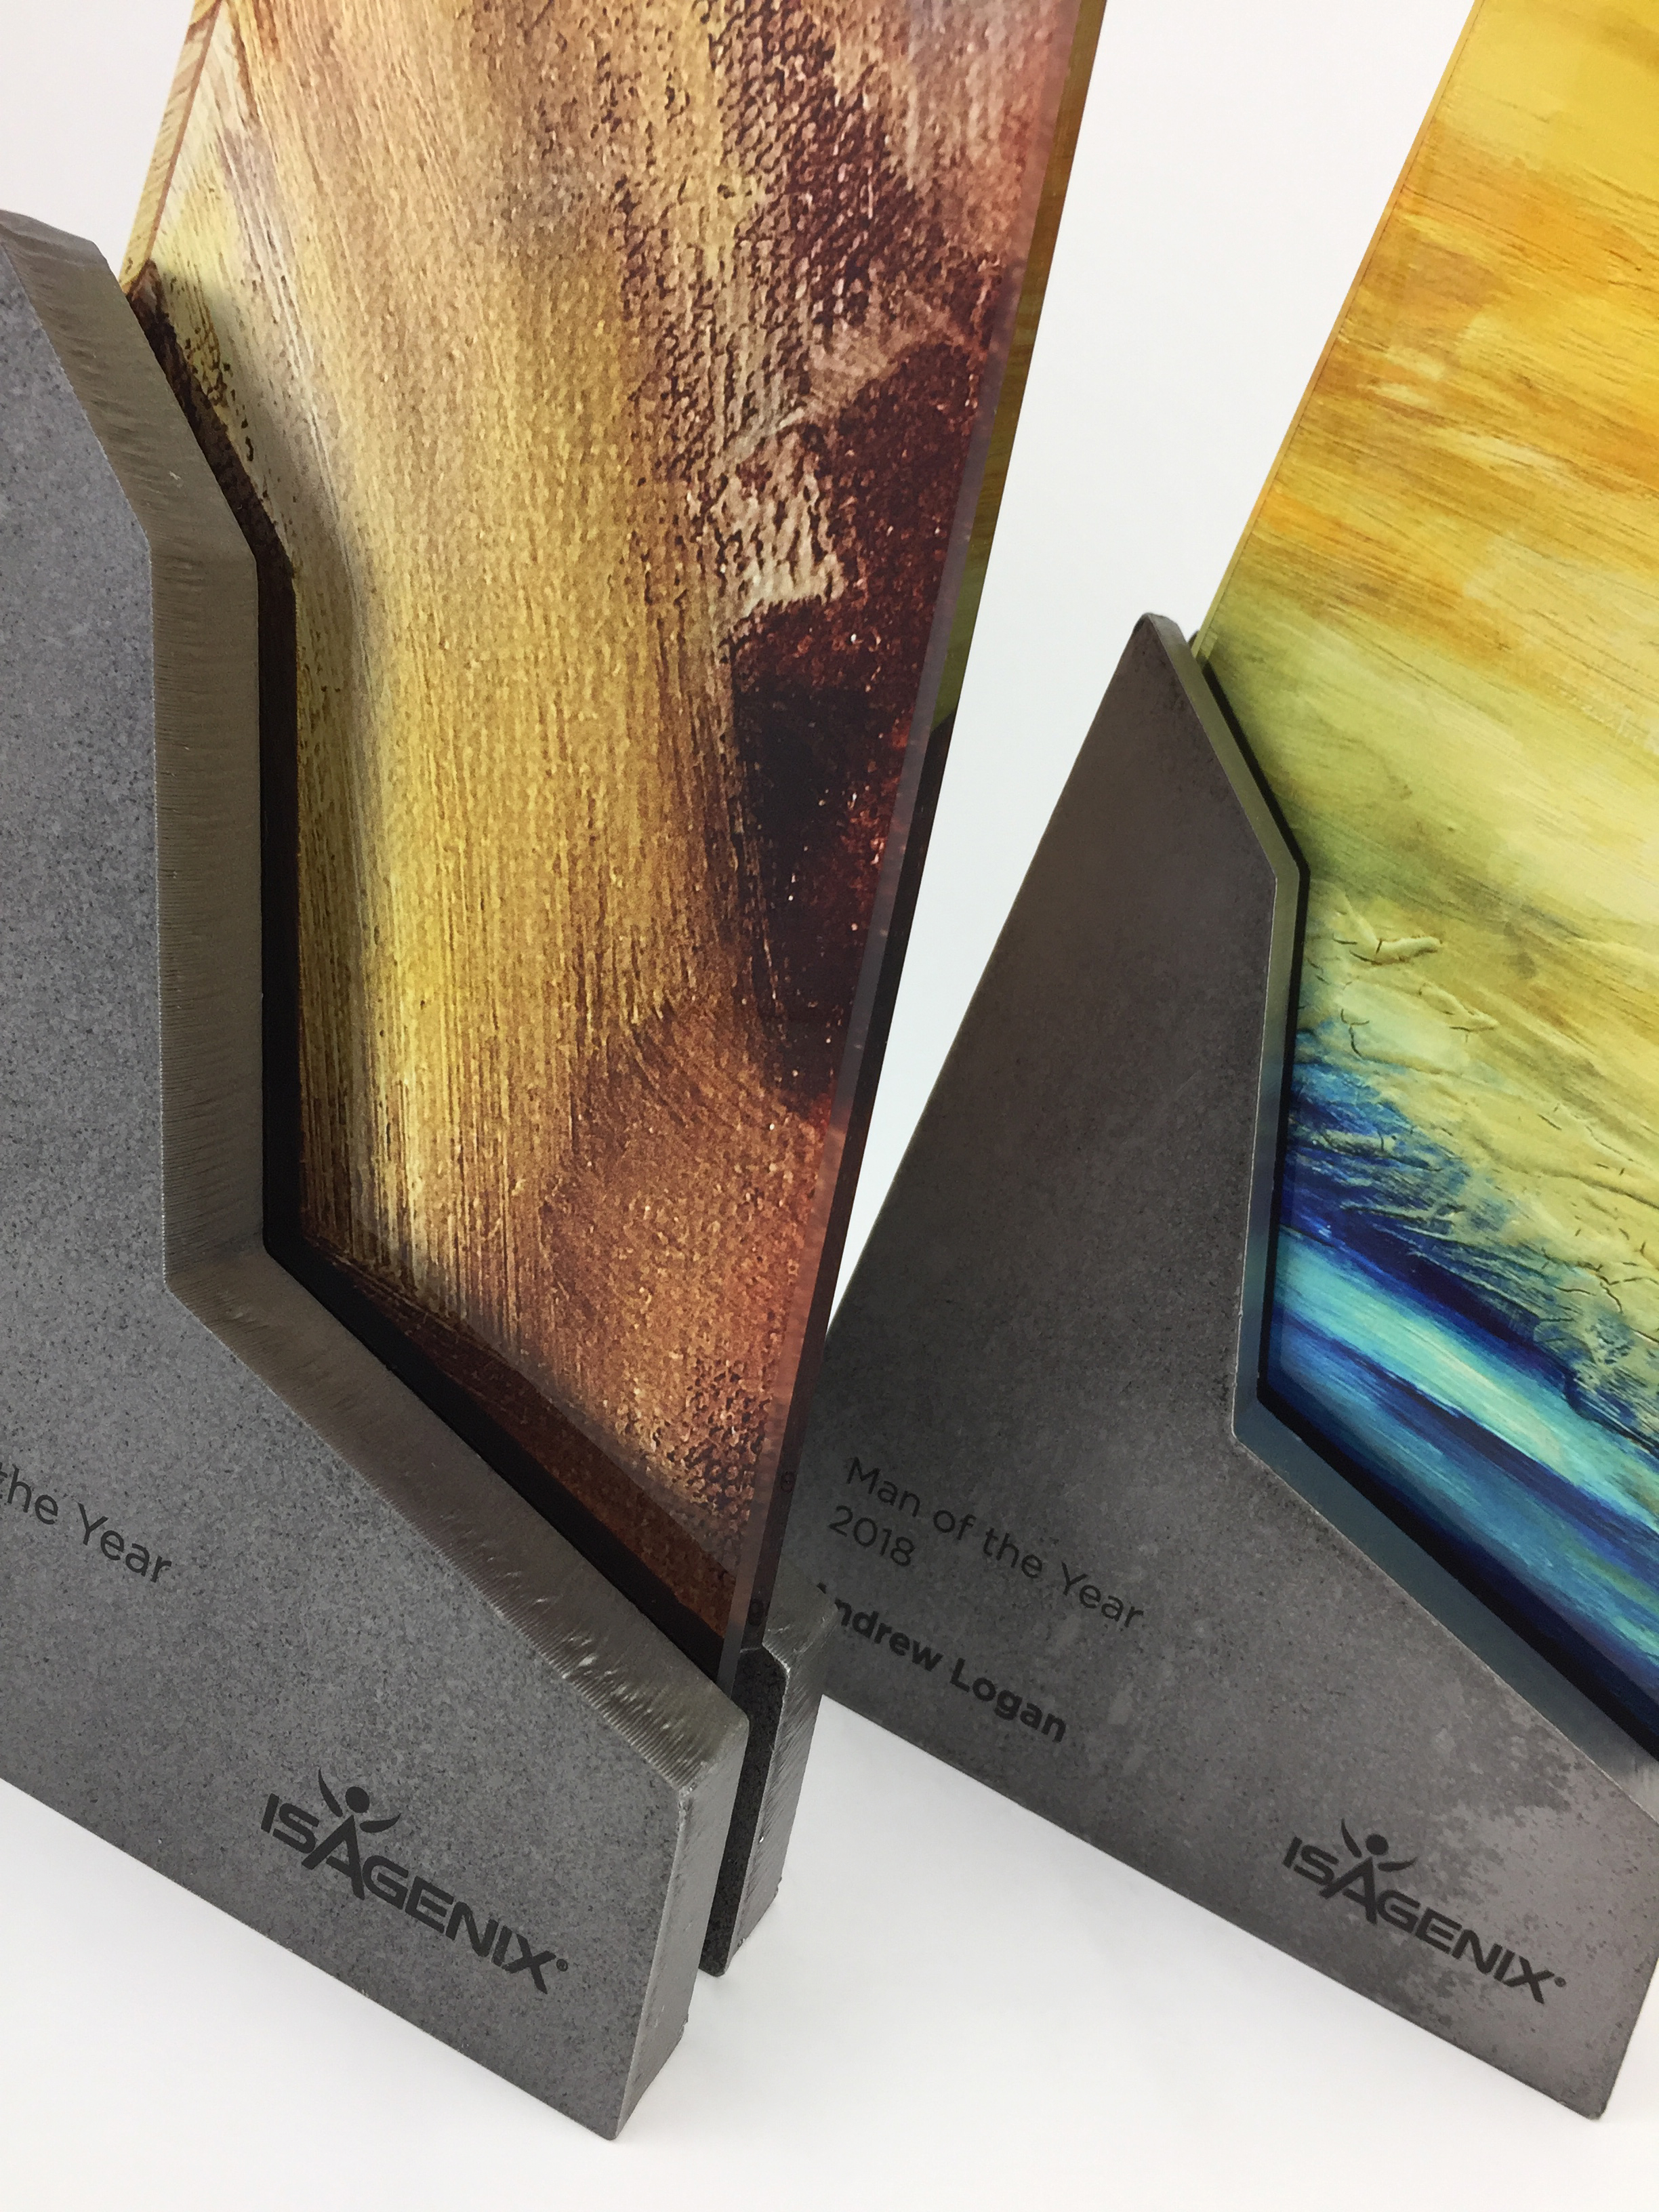 isagenix-woman-man-of-year-metal-glass-art-trophy-awards-sculpture-02.jpg